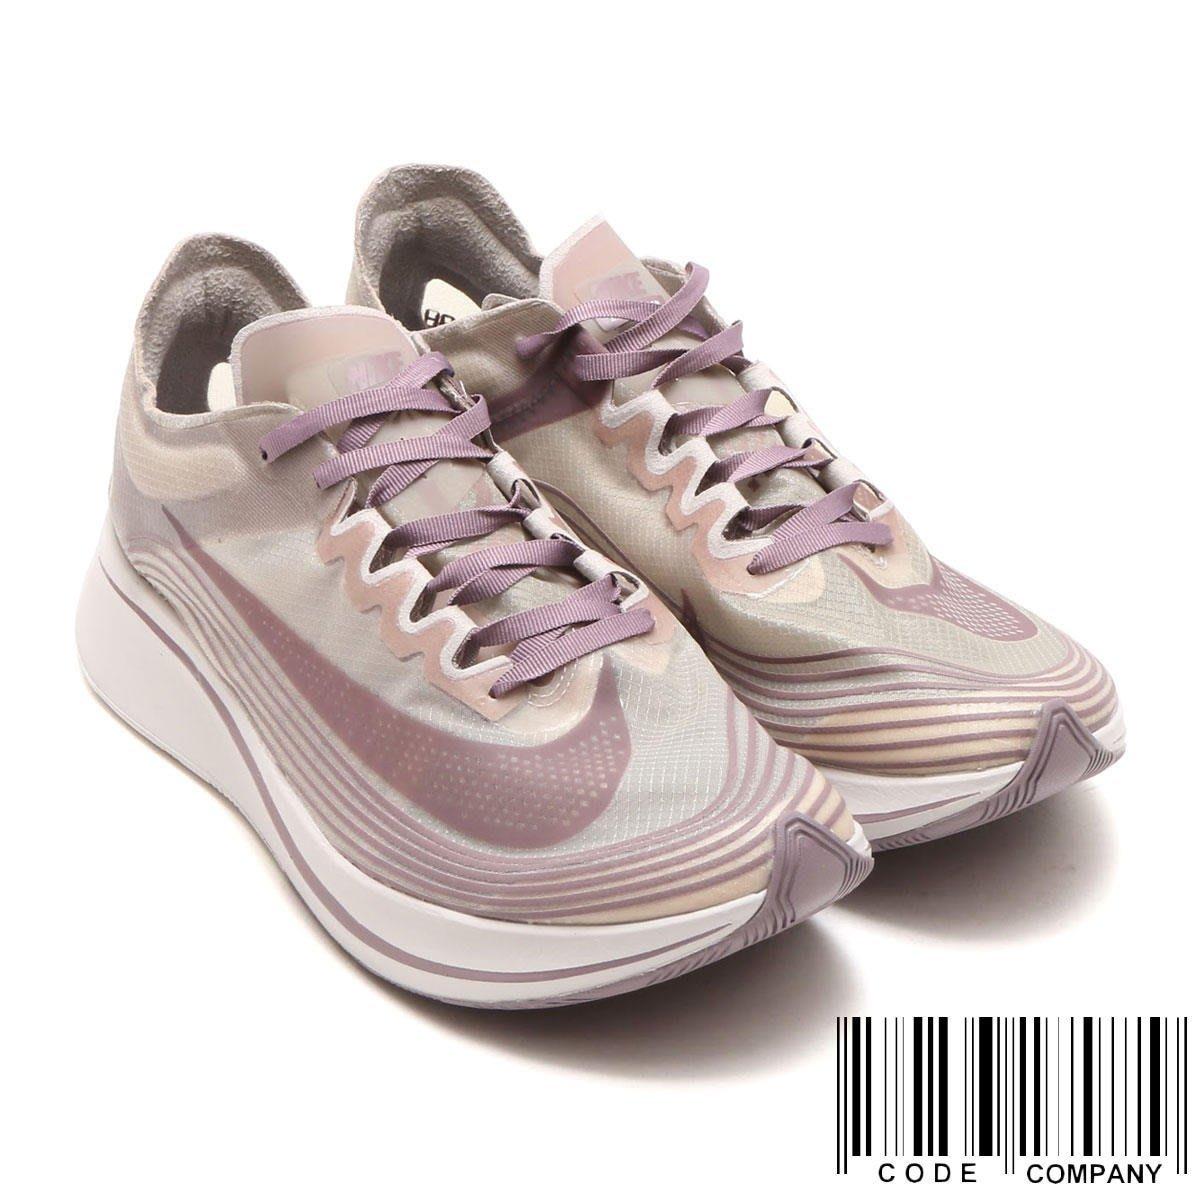 e87317c911f6 CodE  NIKE ZOOM FLY SP CHICAGO 芝加哥限定慢跑鞋(粉紫)AA3172-200 男女 ...